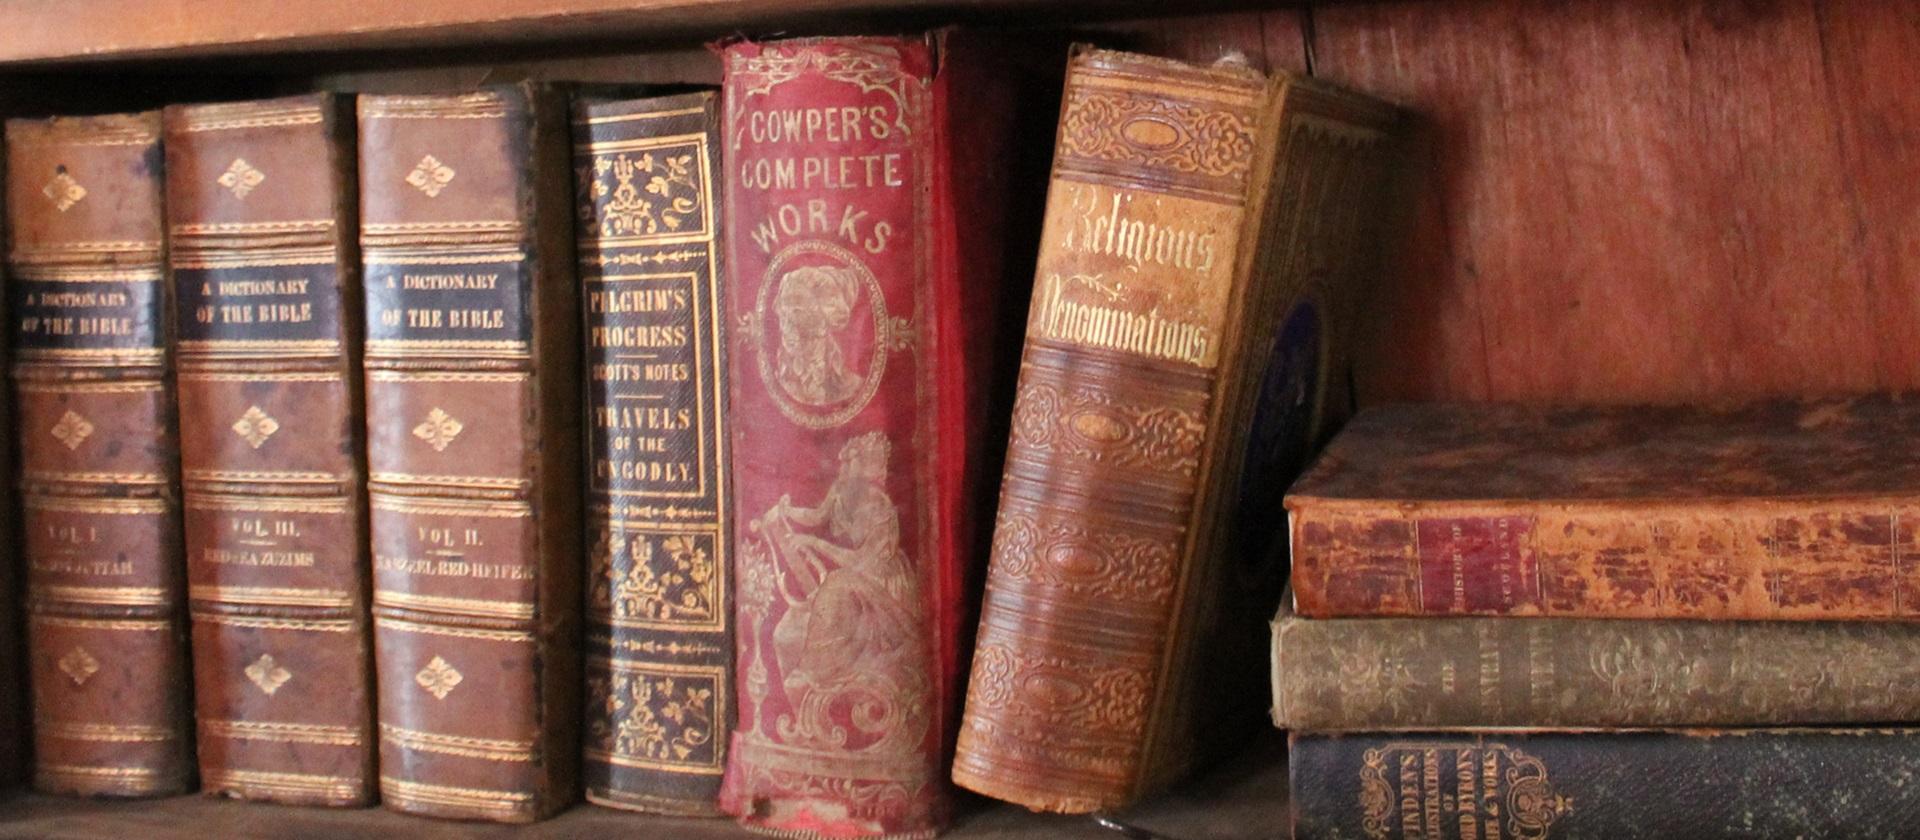 old books on a shelf at Black Creek Pioneer Village